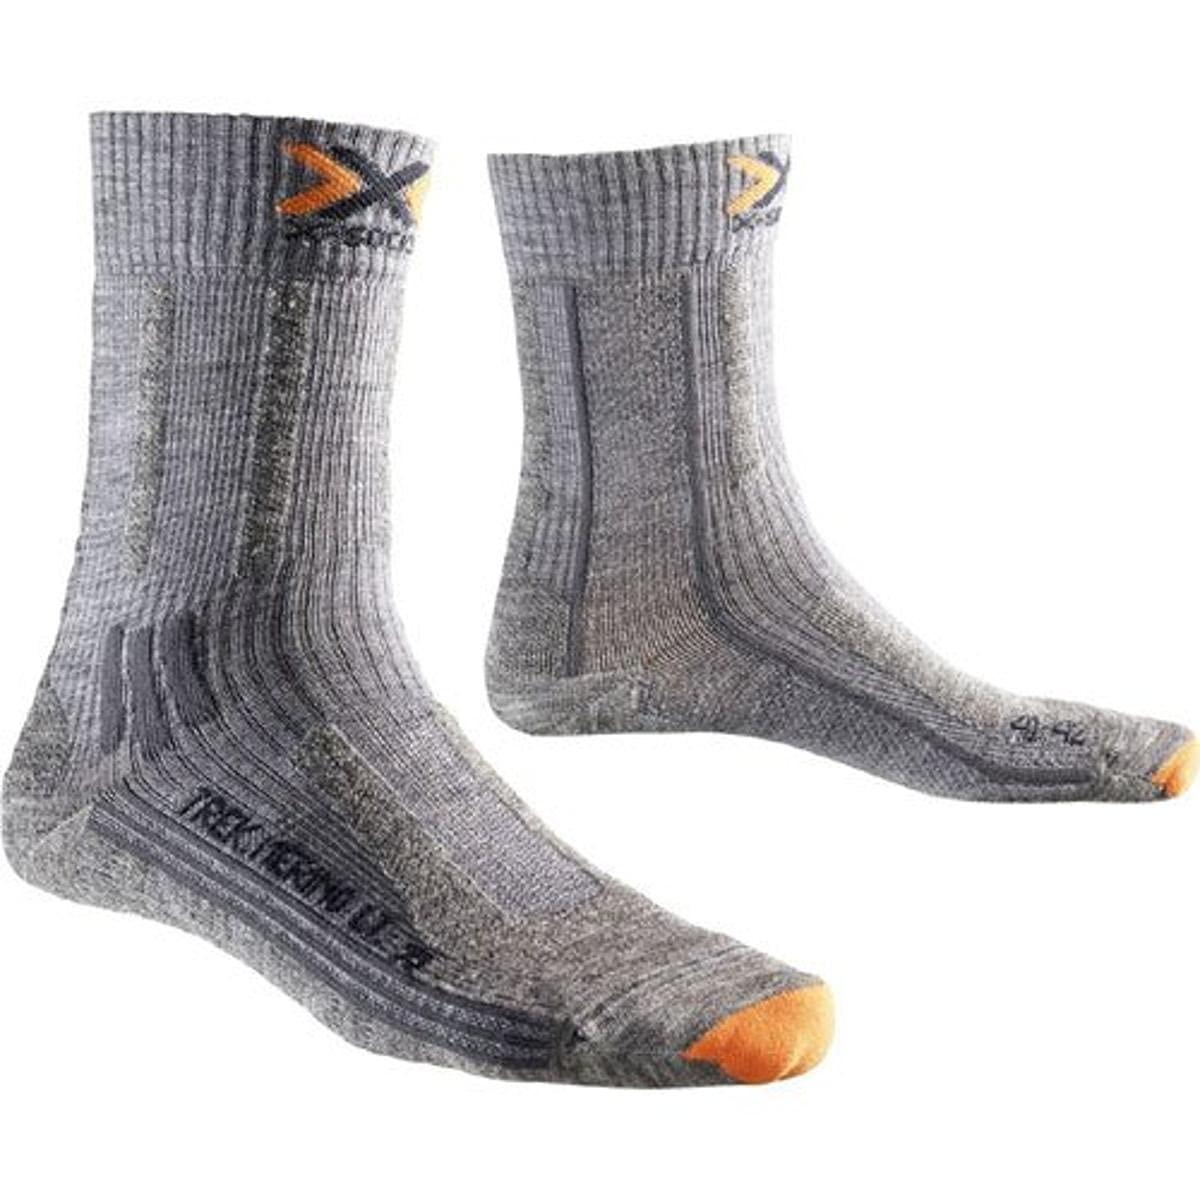 X-Socks Erwachsene Funktionssocken Trekking Merino Lady, Light Grey, 35/36